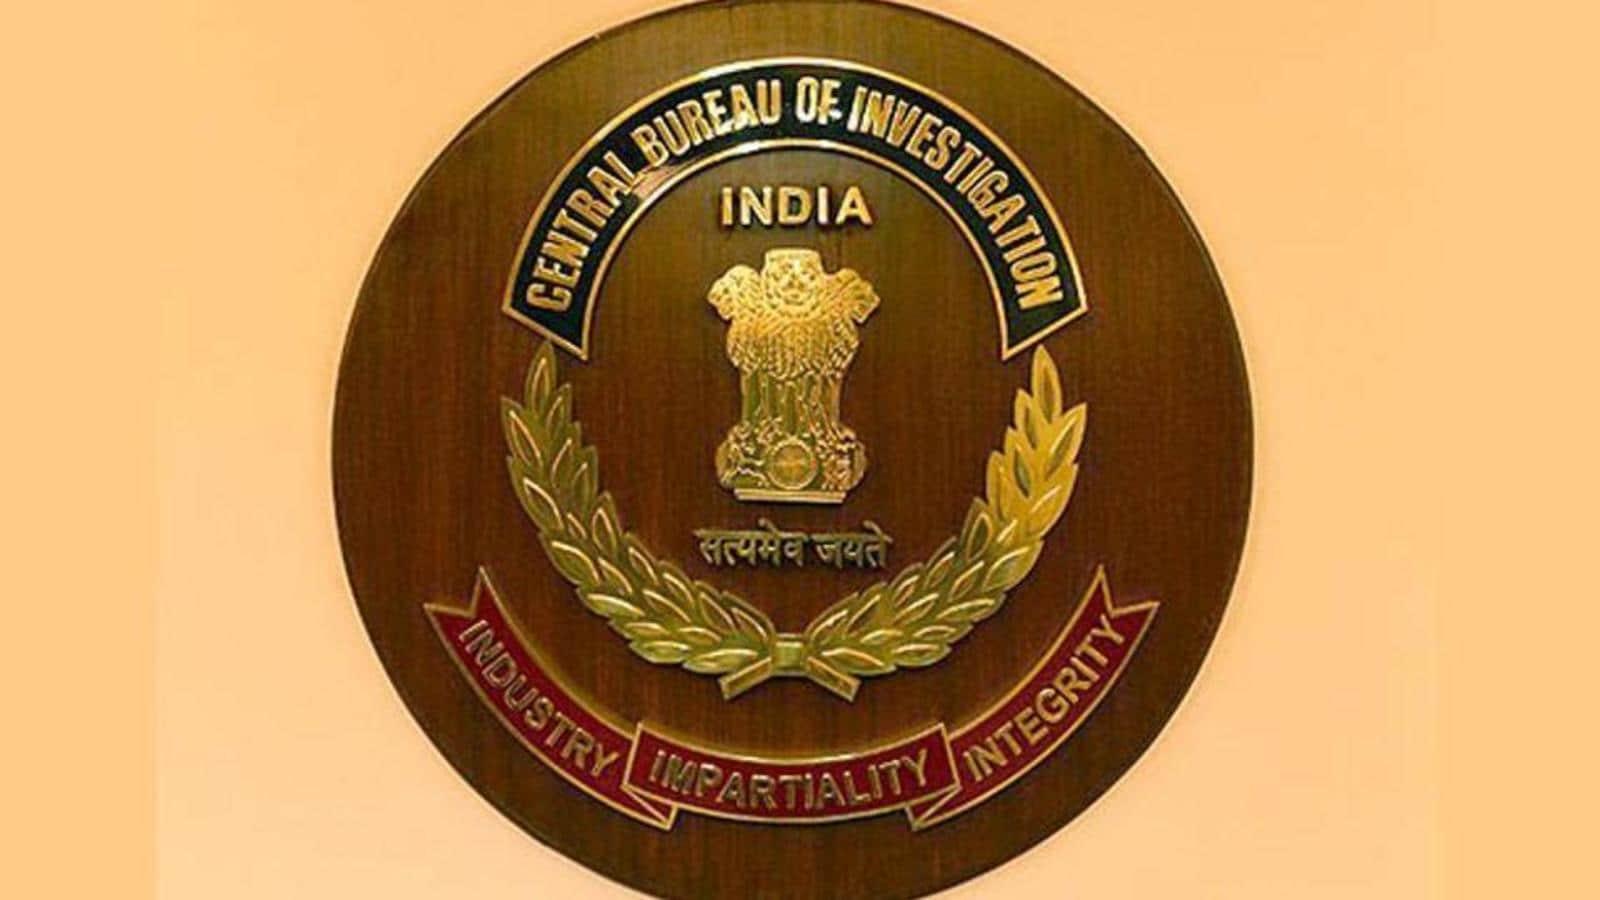 CBI arrests 4 in Bengal coal smuggling case; quizzes TMC MLA in chit fund probe